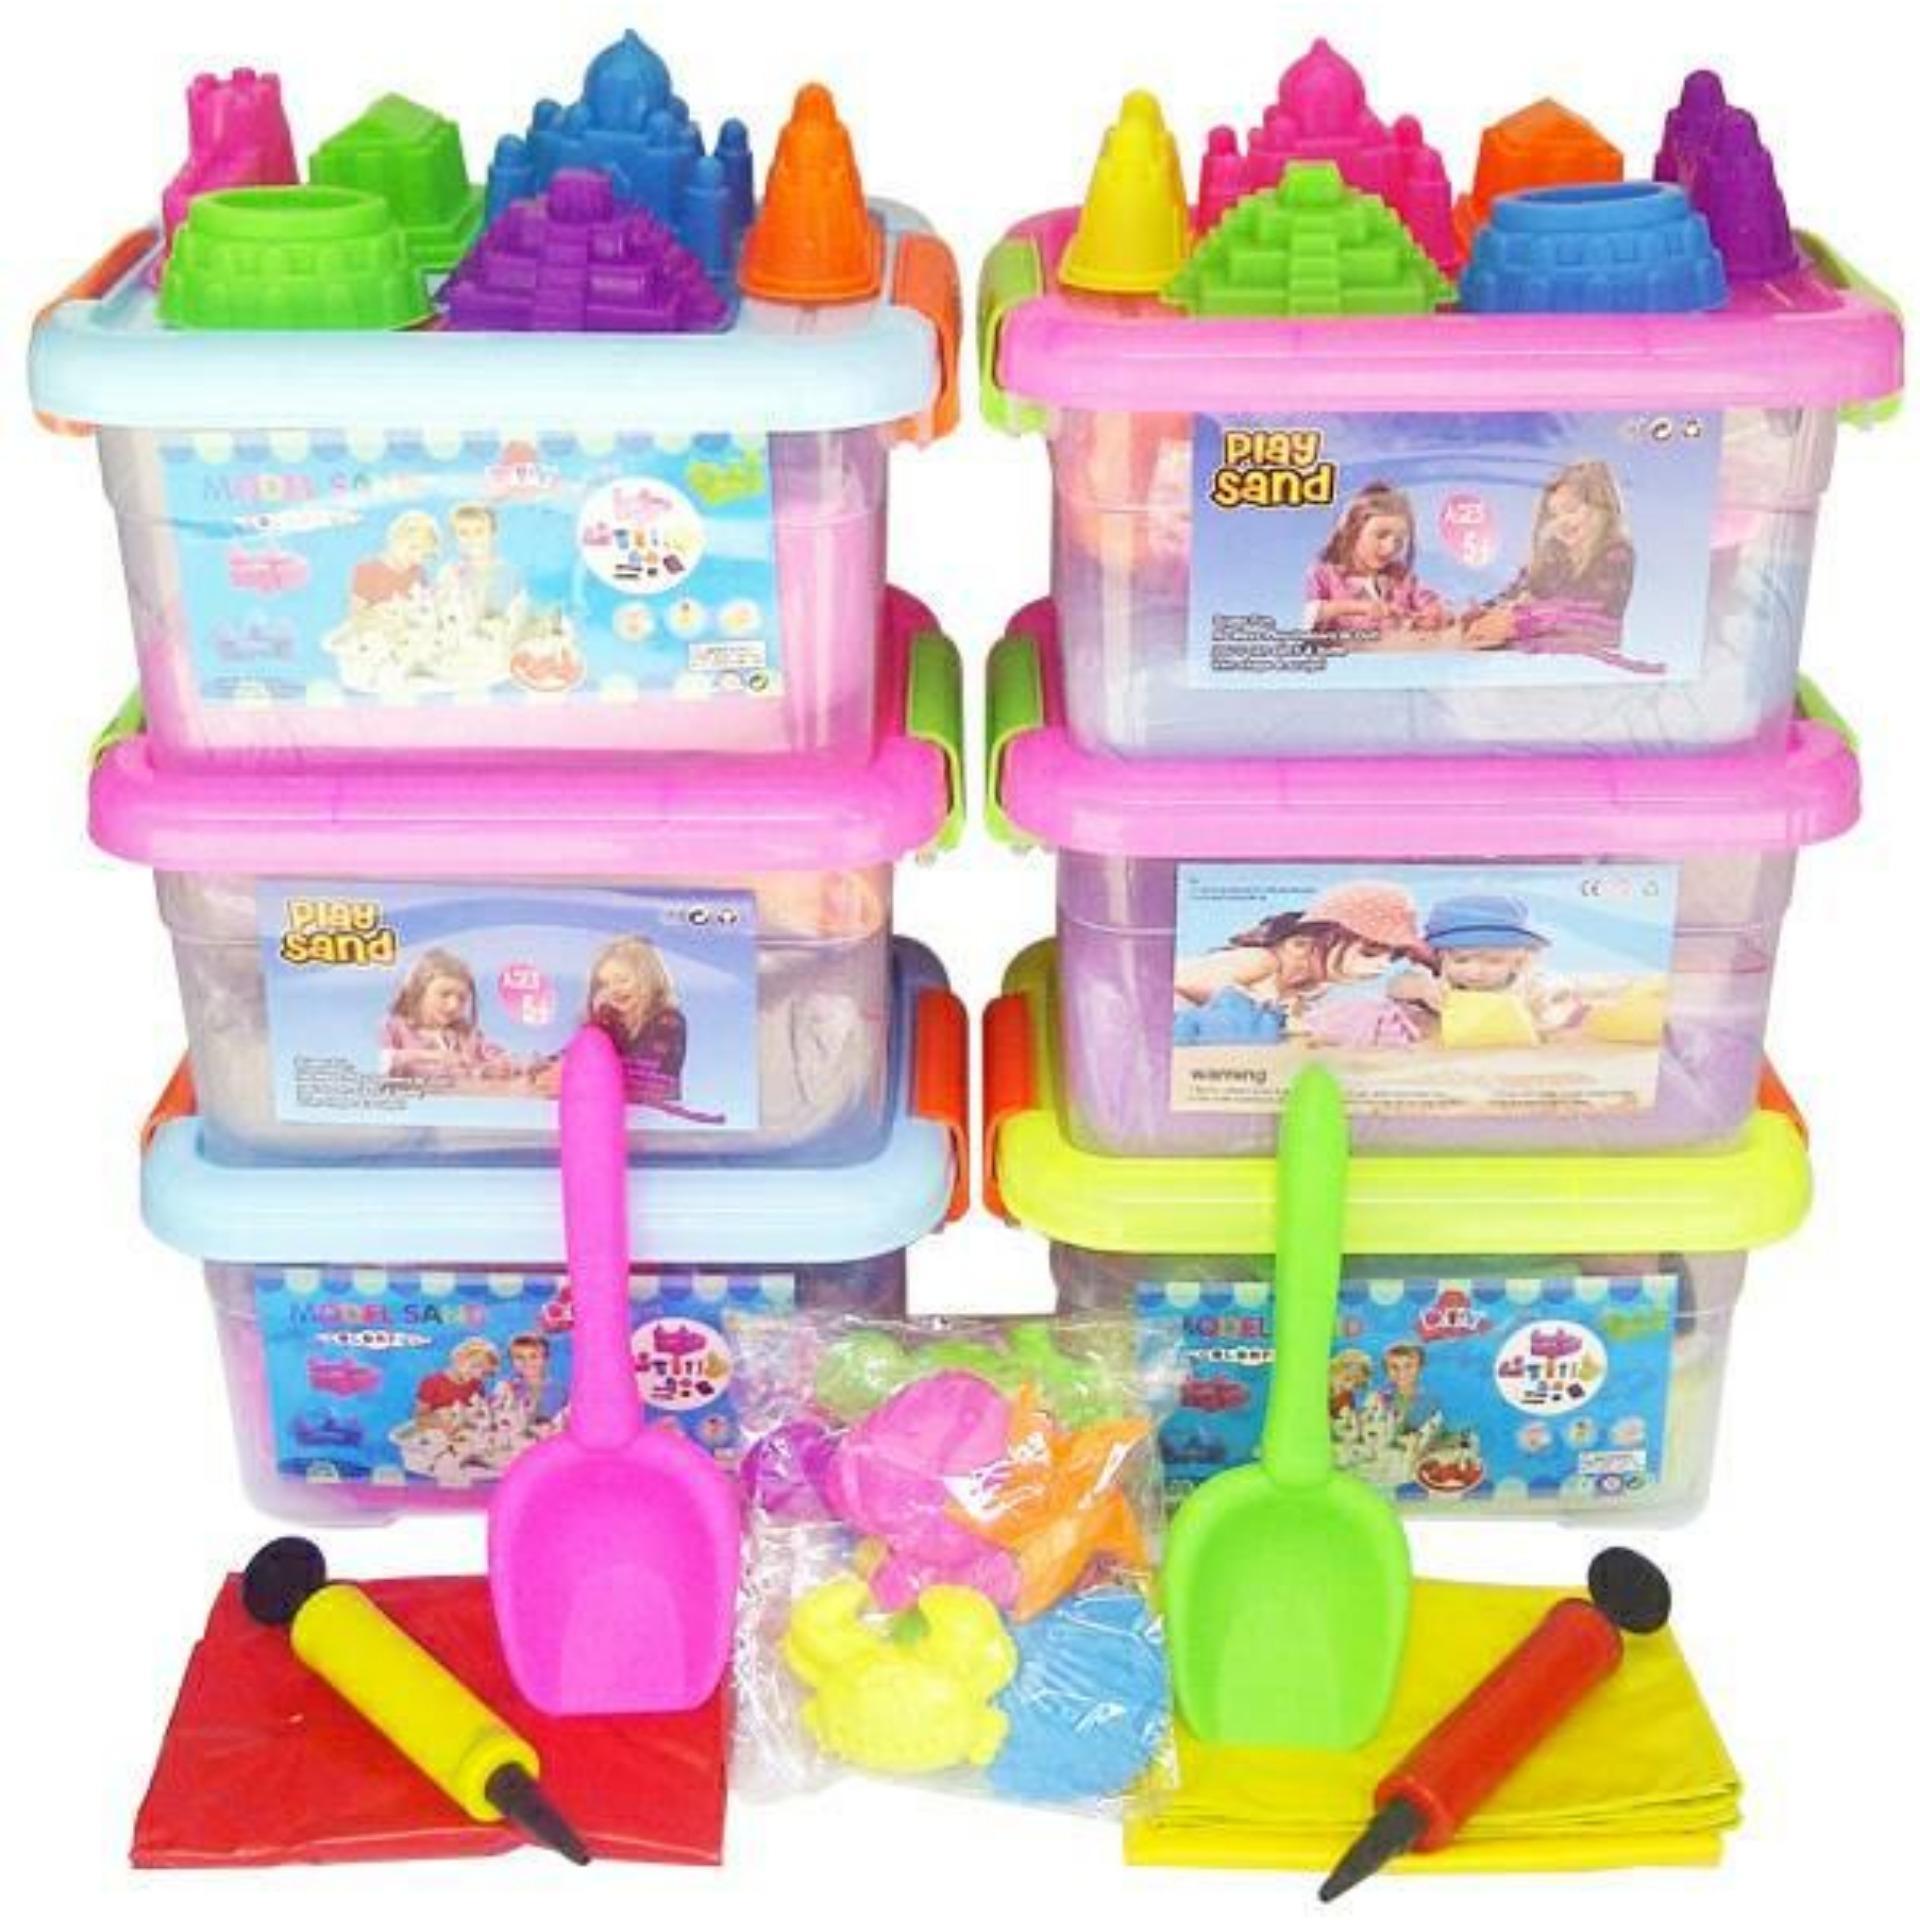 Flash Sale Promo Termurah Mainan Pasir Kinetik Super Jumbo 2 Kg Kinetic Play Sand